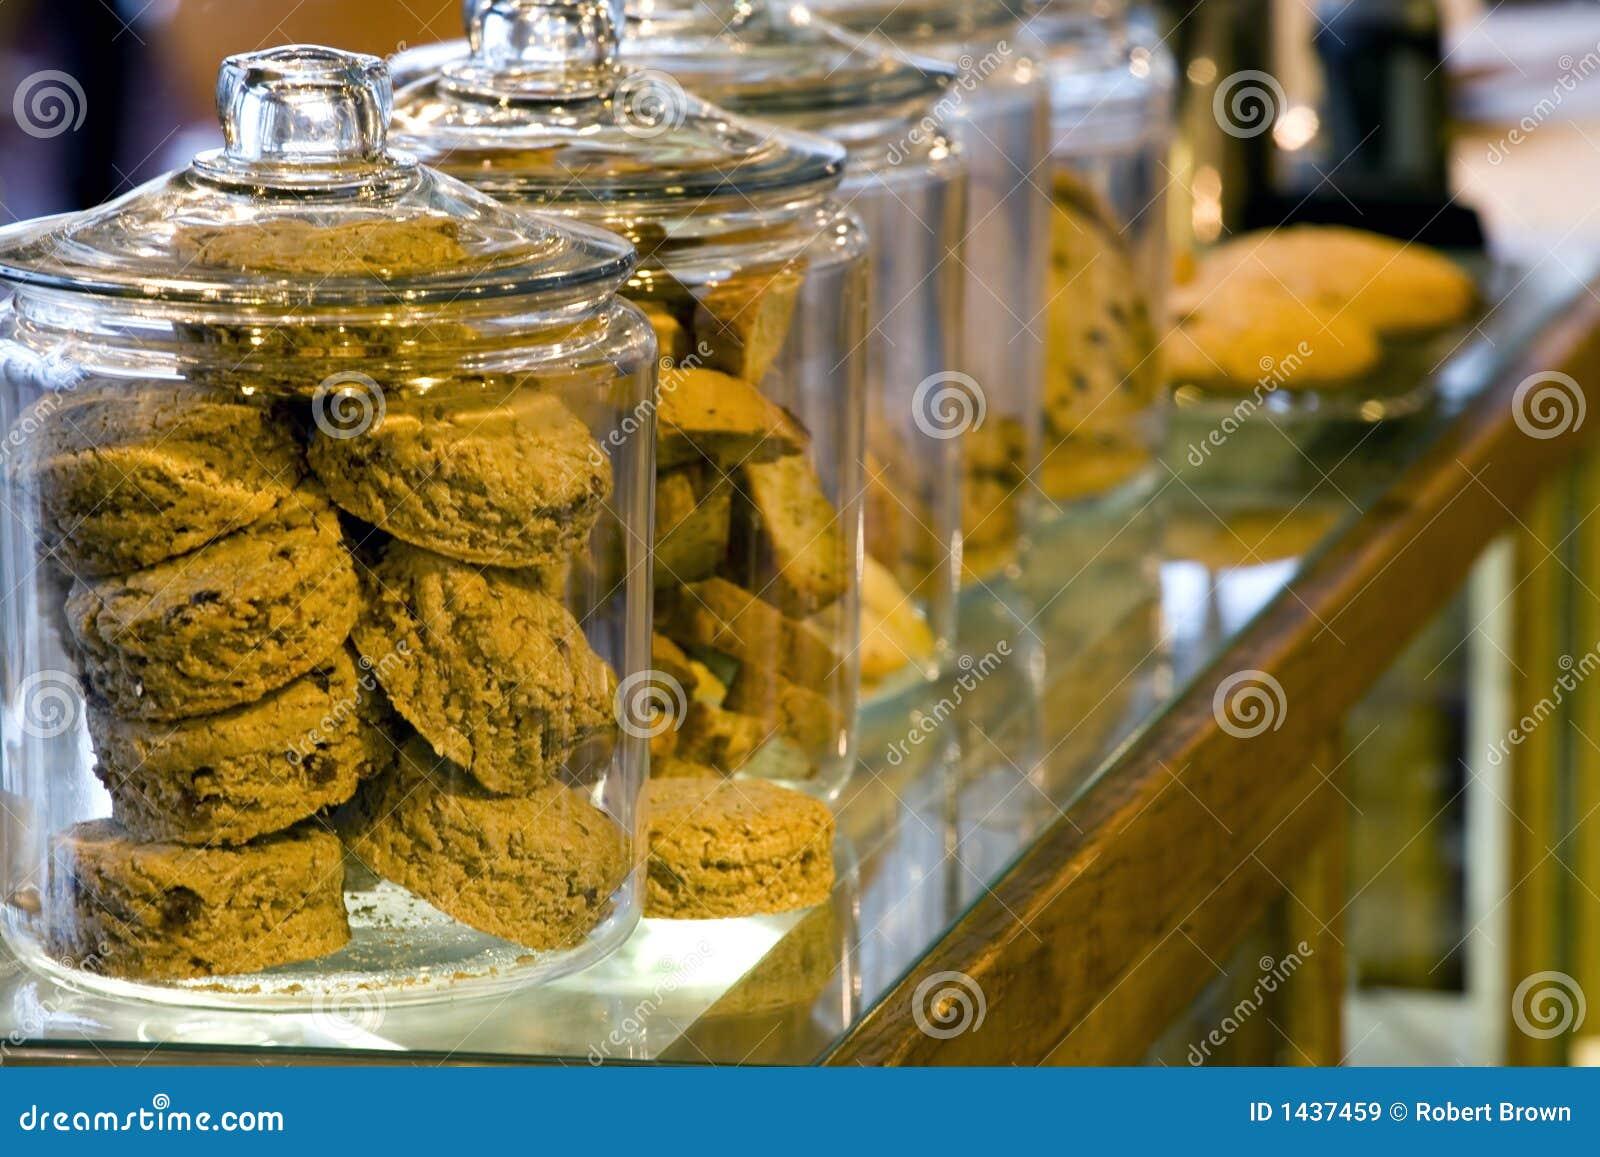 royaltyfree stock photo download glass cookie jars